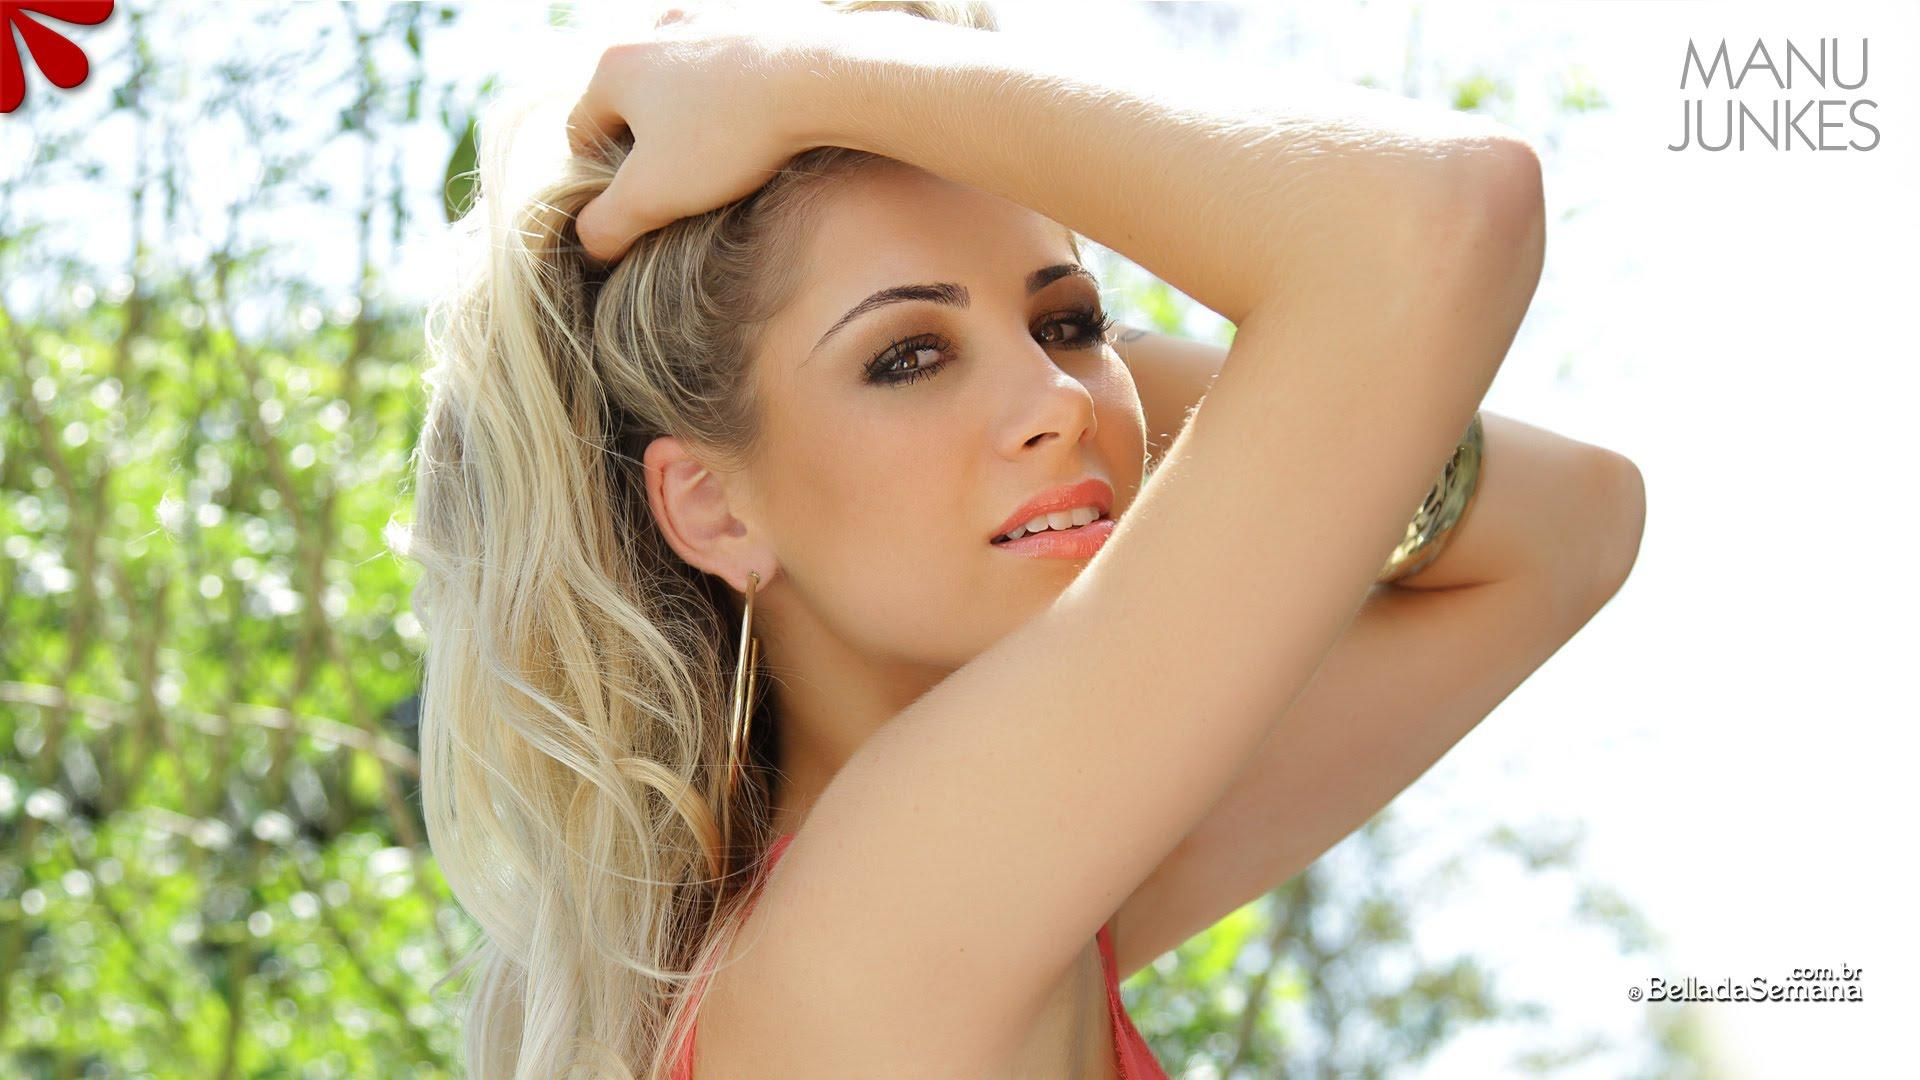 Manu Junkes | Part 2 | Sexy Super Models | Bikini Babes | Hot Photo Shoot | Bella Club